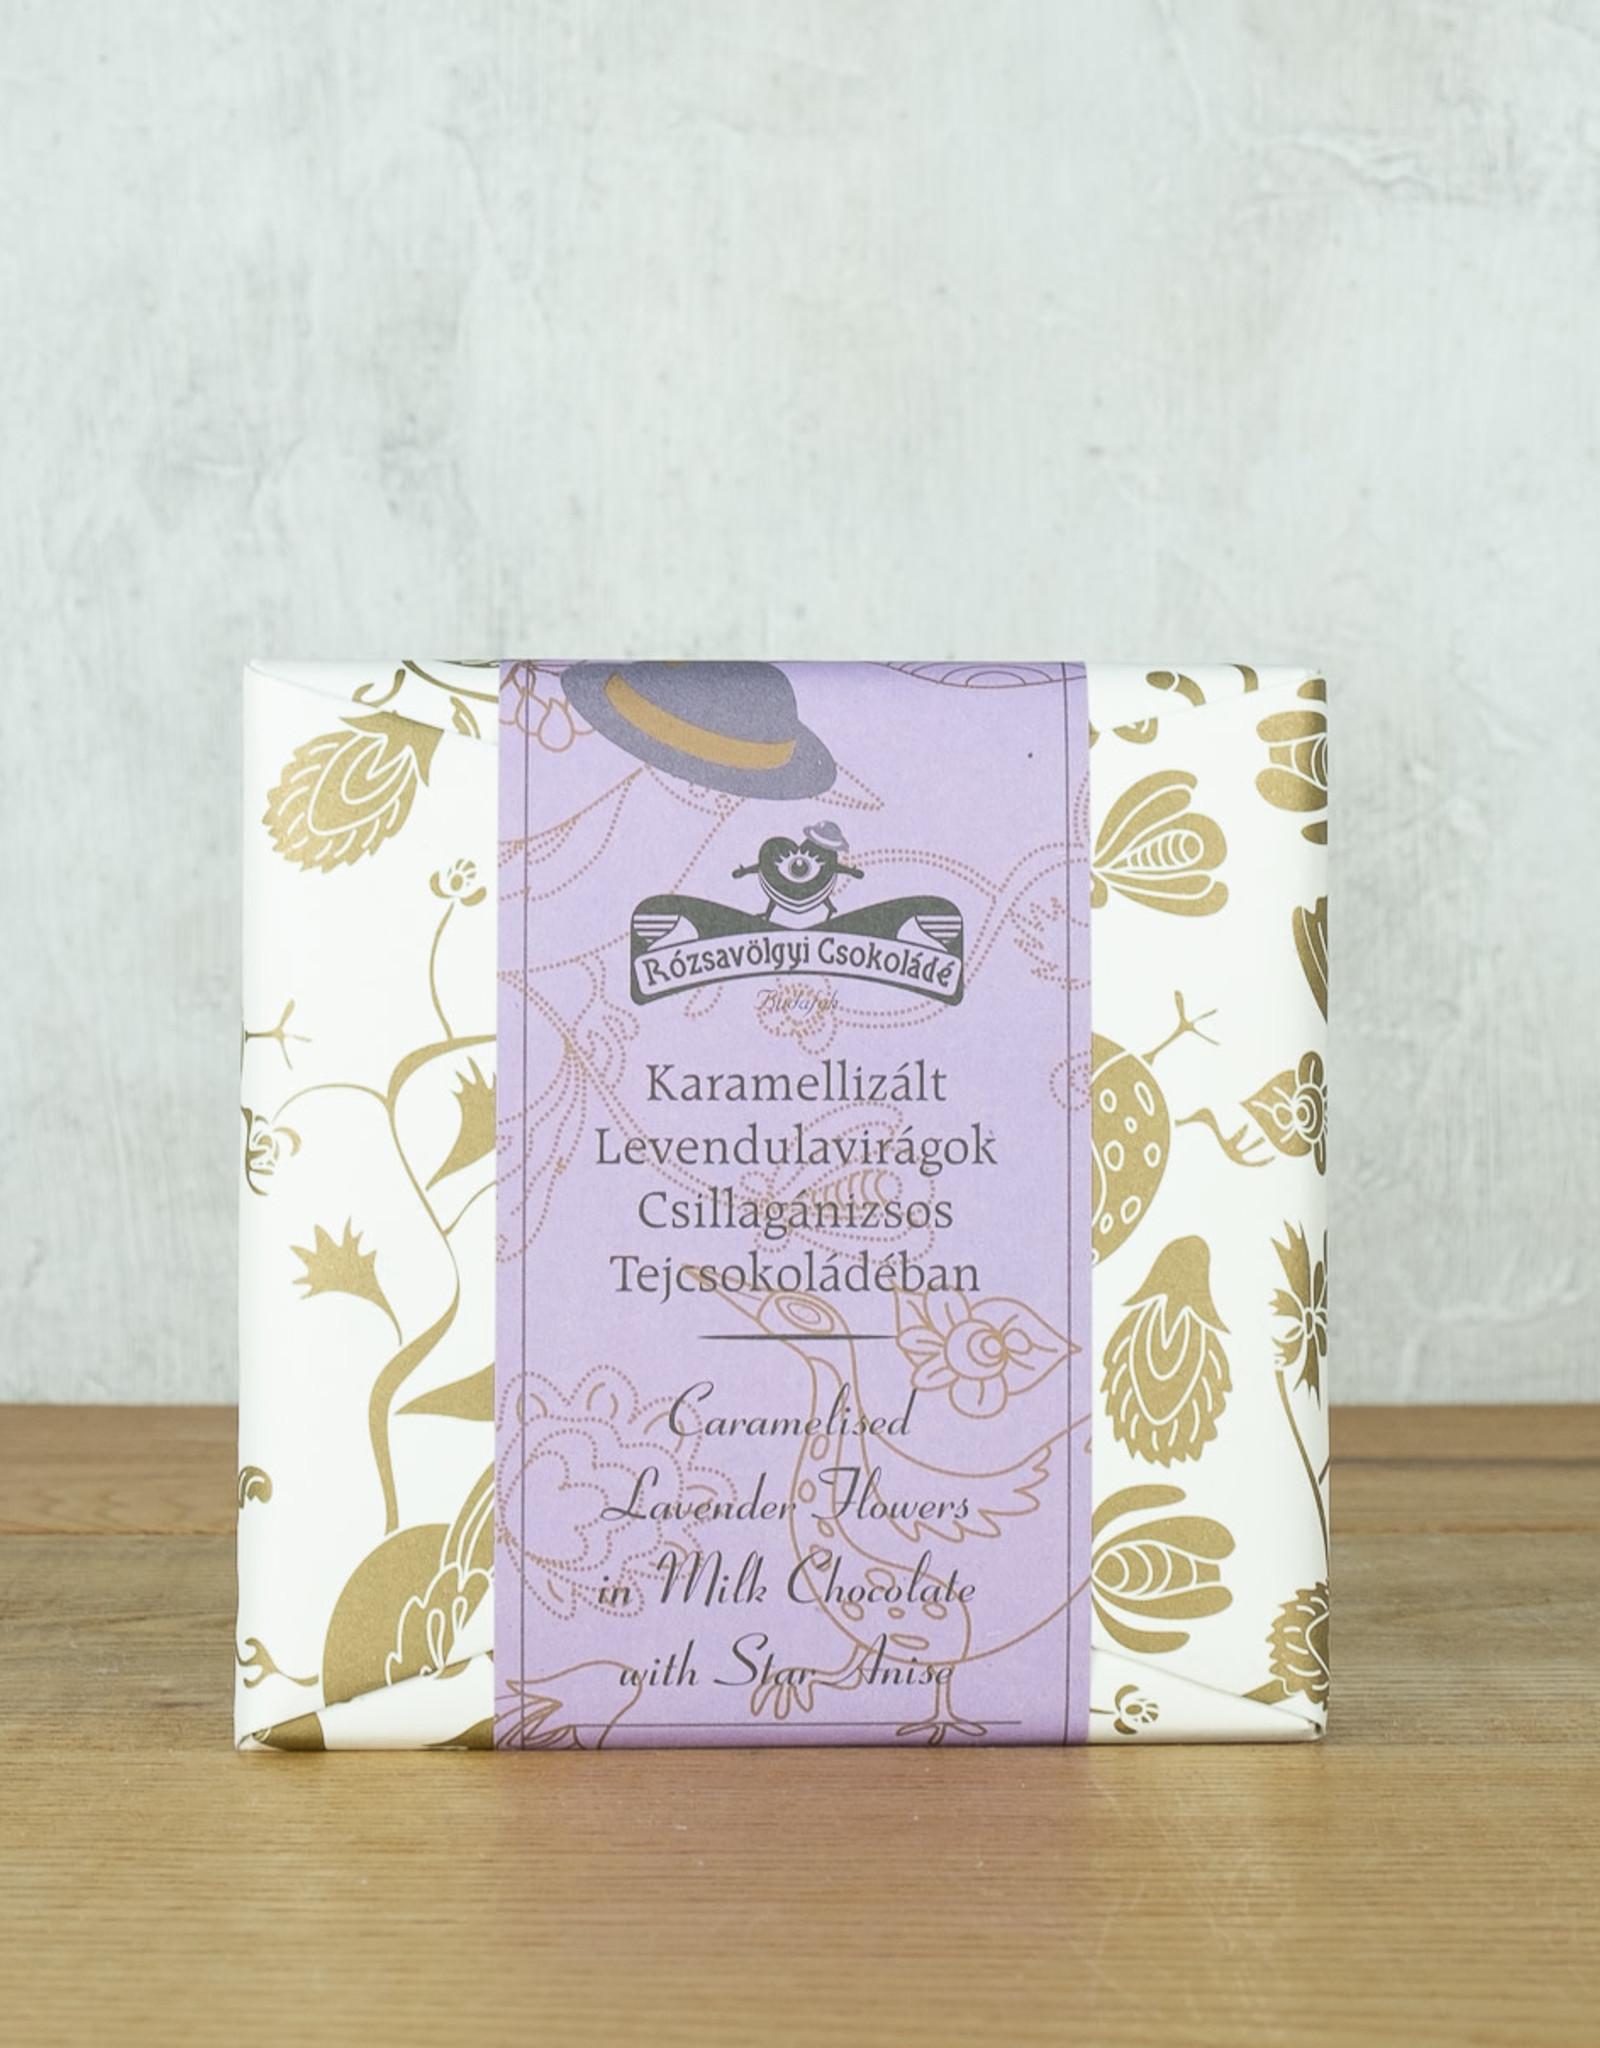 Rózsavölgyi Csokoládá Milk Chocolate with Caramelized Lavendar Flowers